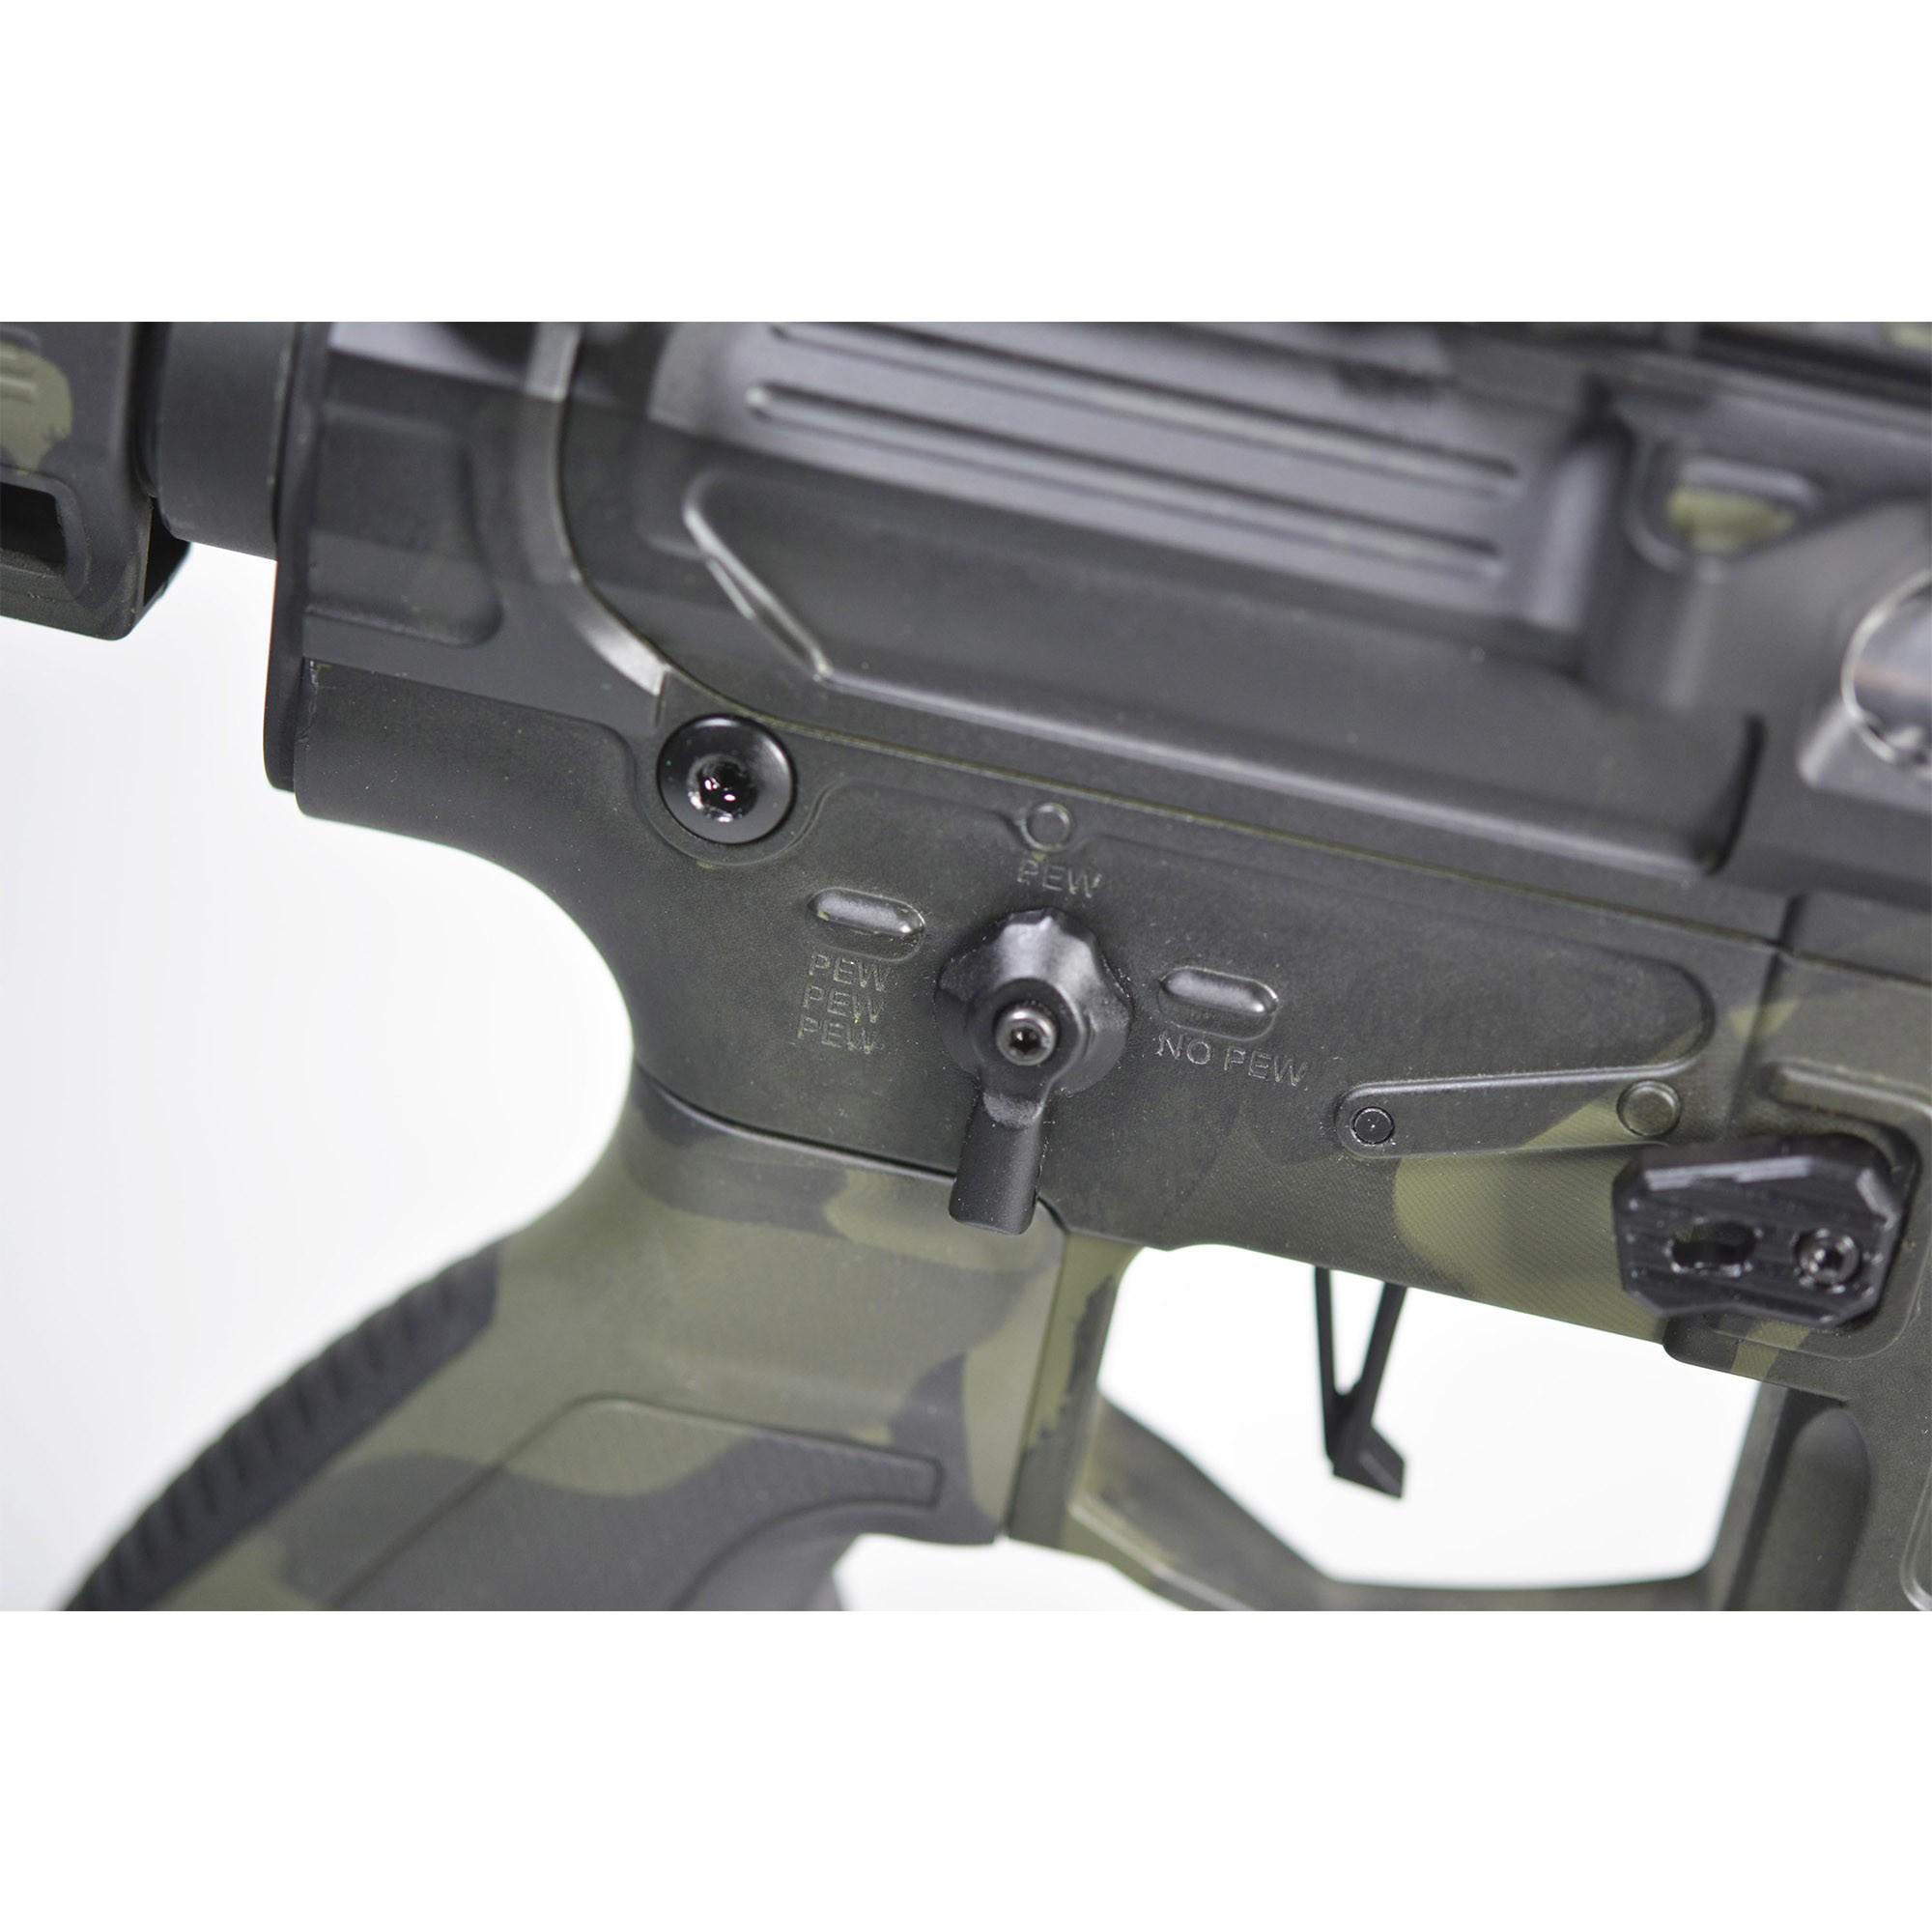 RIFLE DE AIRSOFT AEG M4 PHANTOM EXTREMIS RIFLES BLACKL MULTCAM MKV 10 FULL METAL BOWBACK PER705 - APS